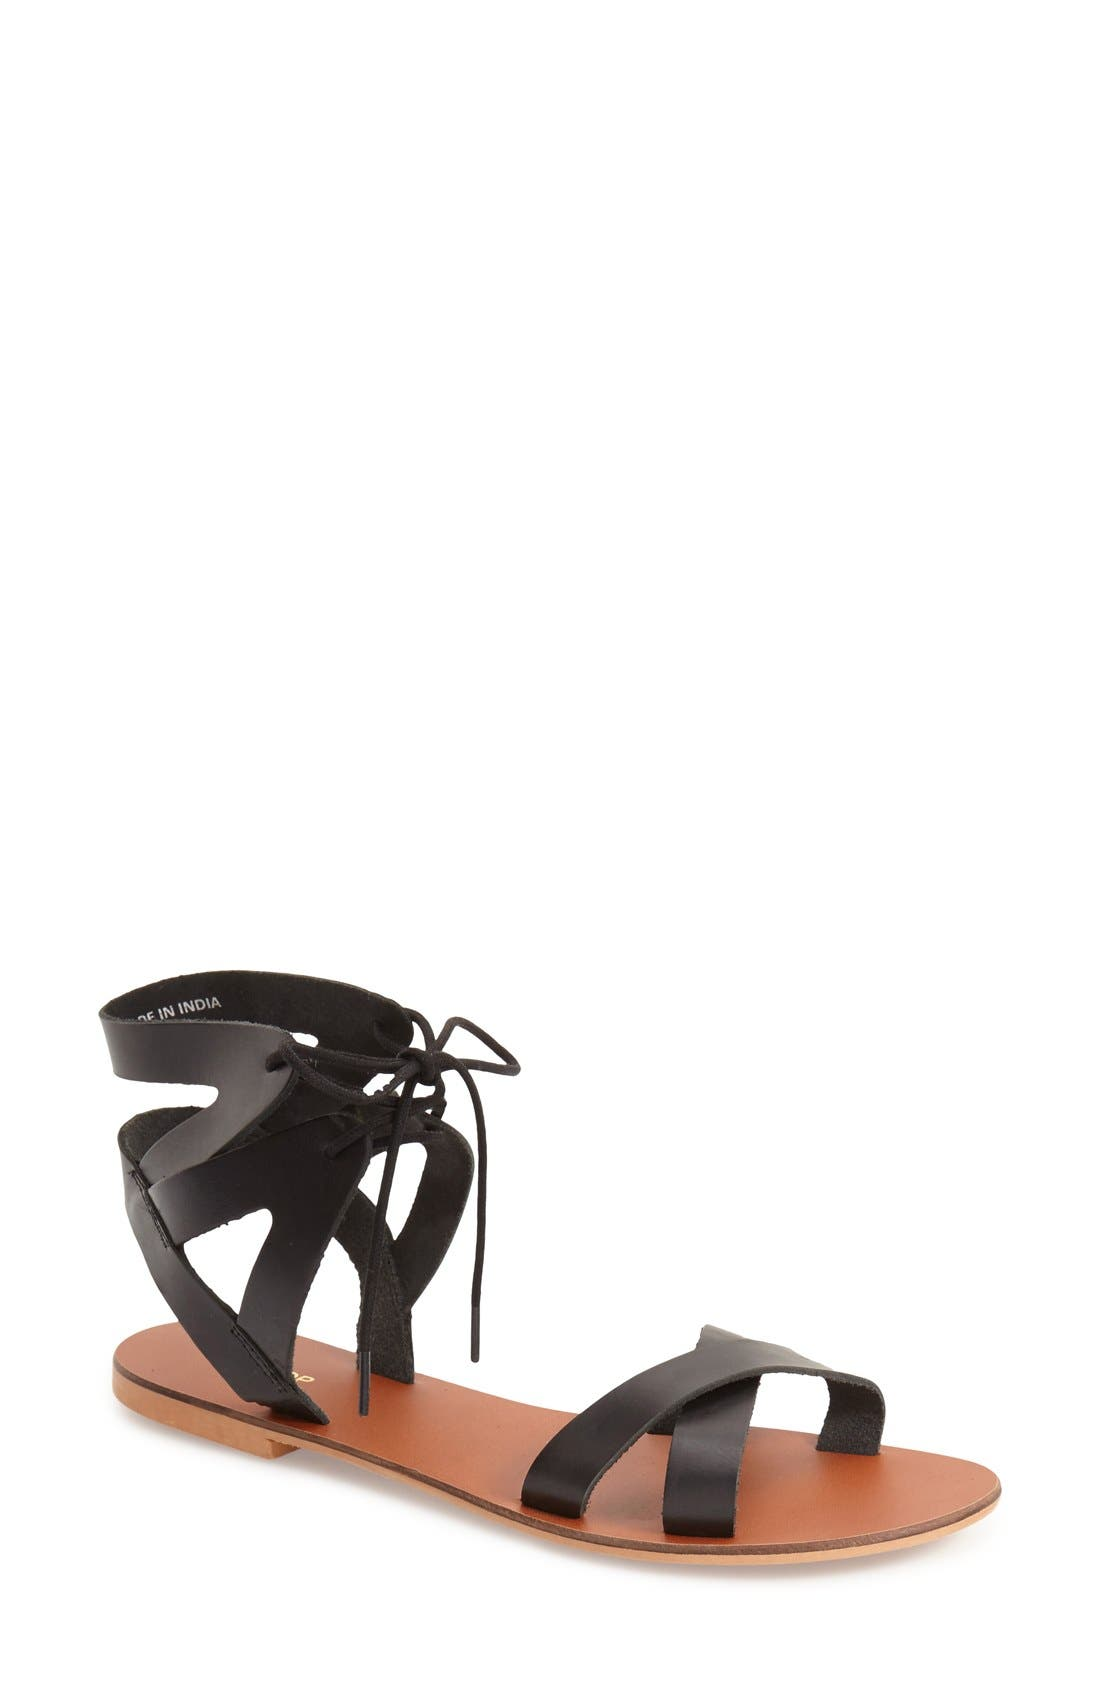 Main Image - Topshop 'Herb' Lace-Up Flat Sandal (Women)